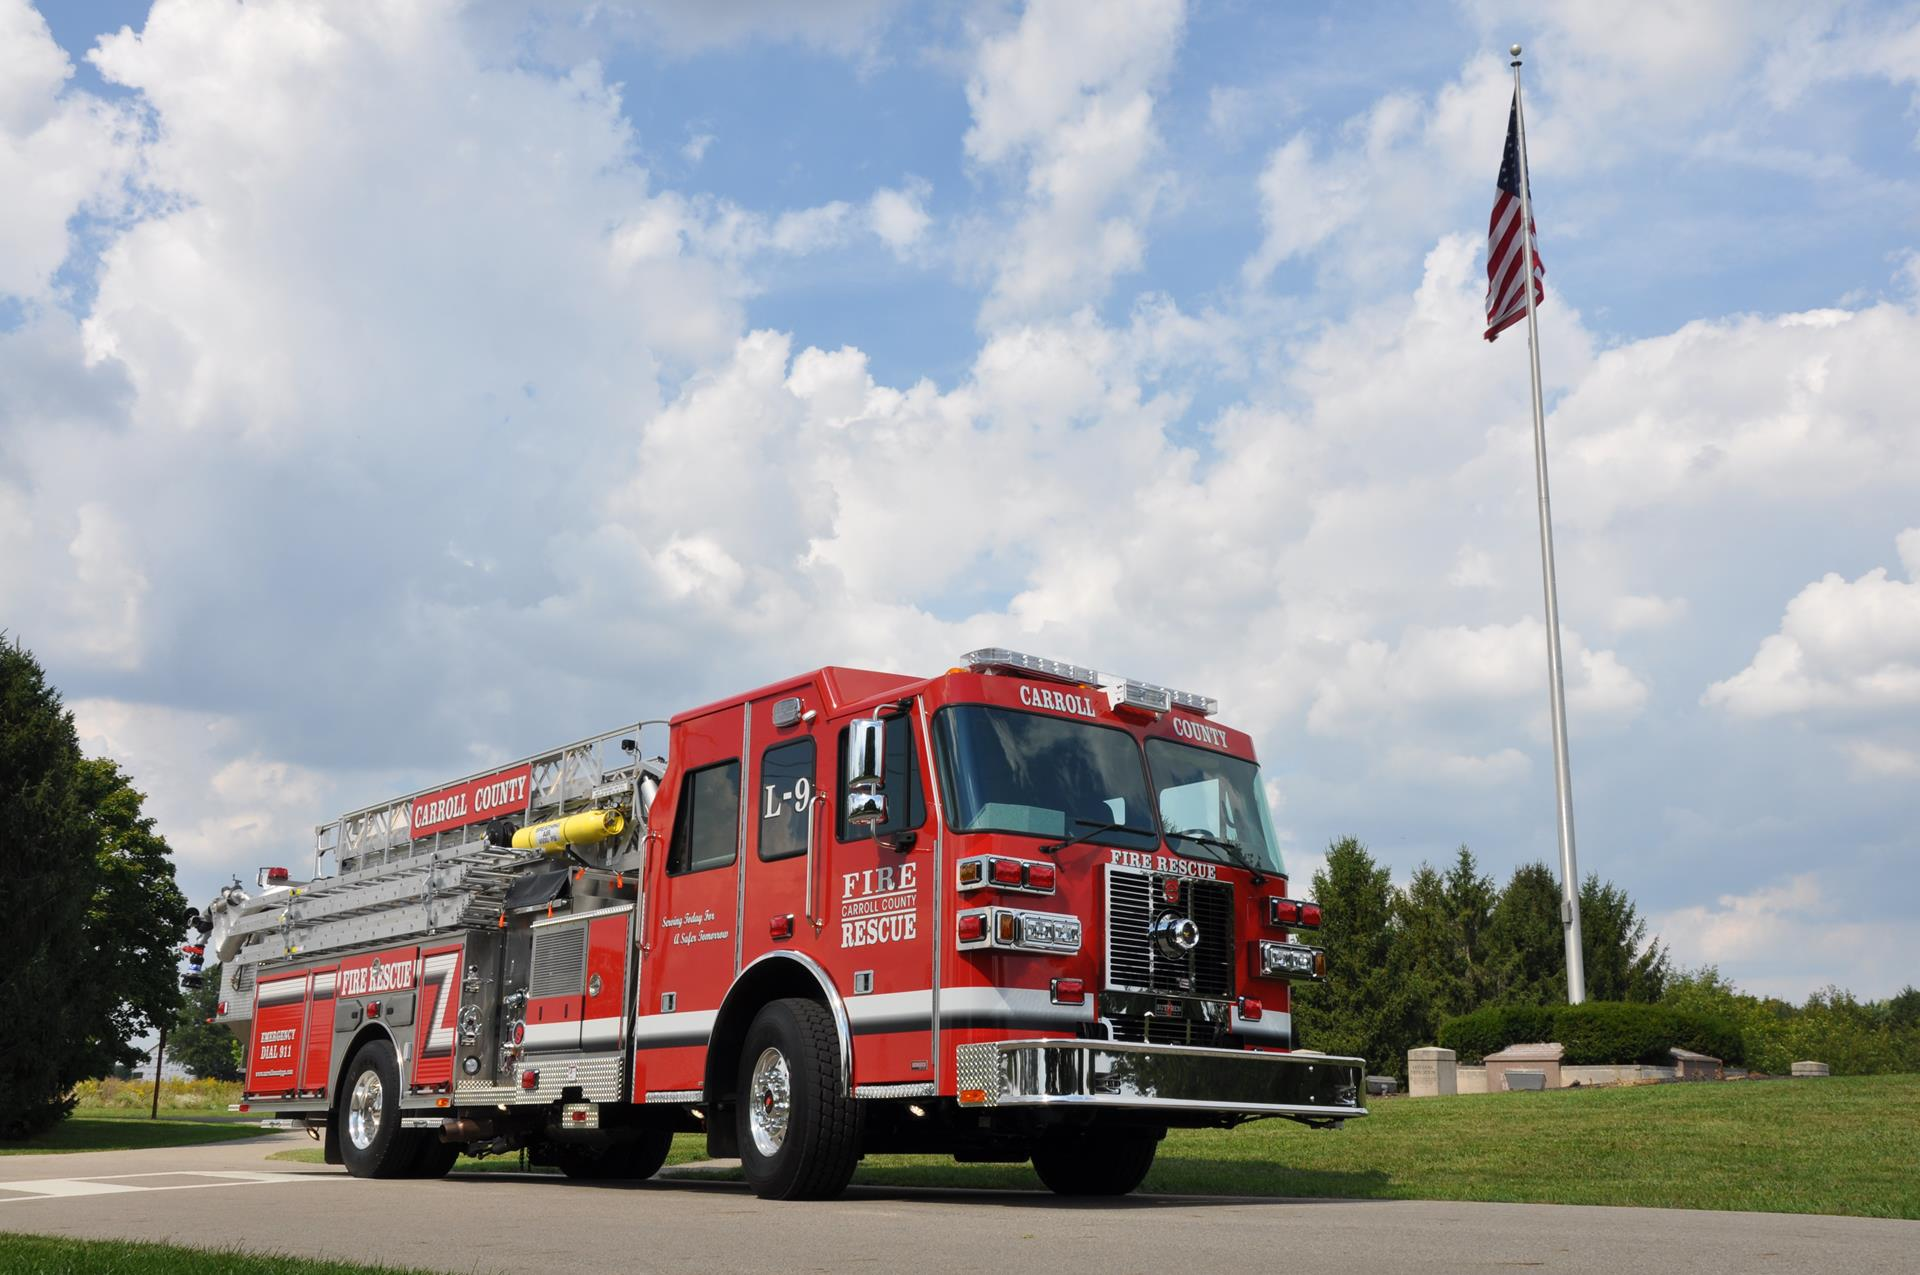 SP 70 – Carroll County Fire, GA